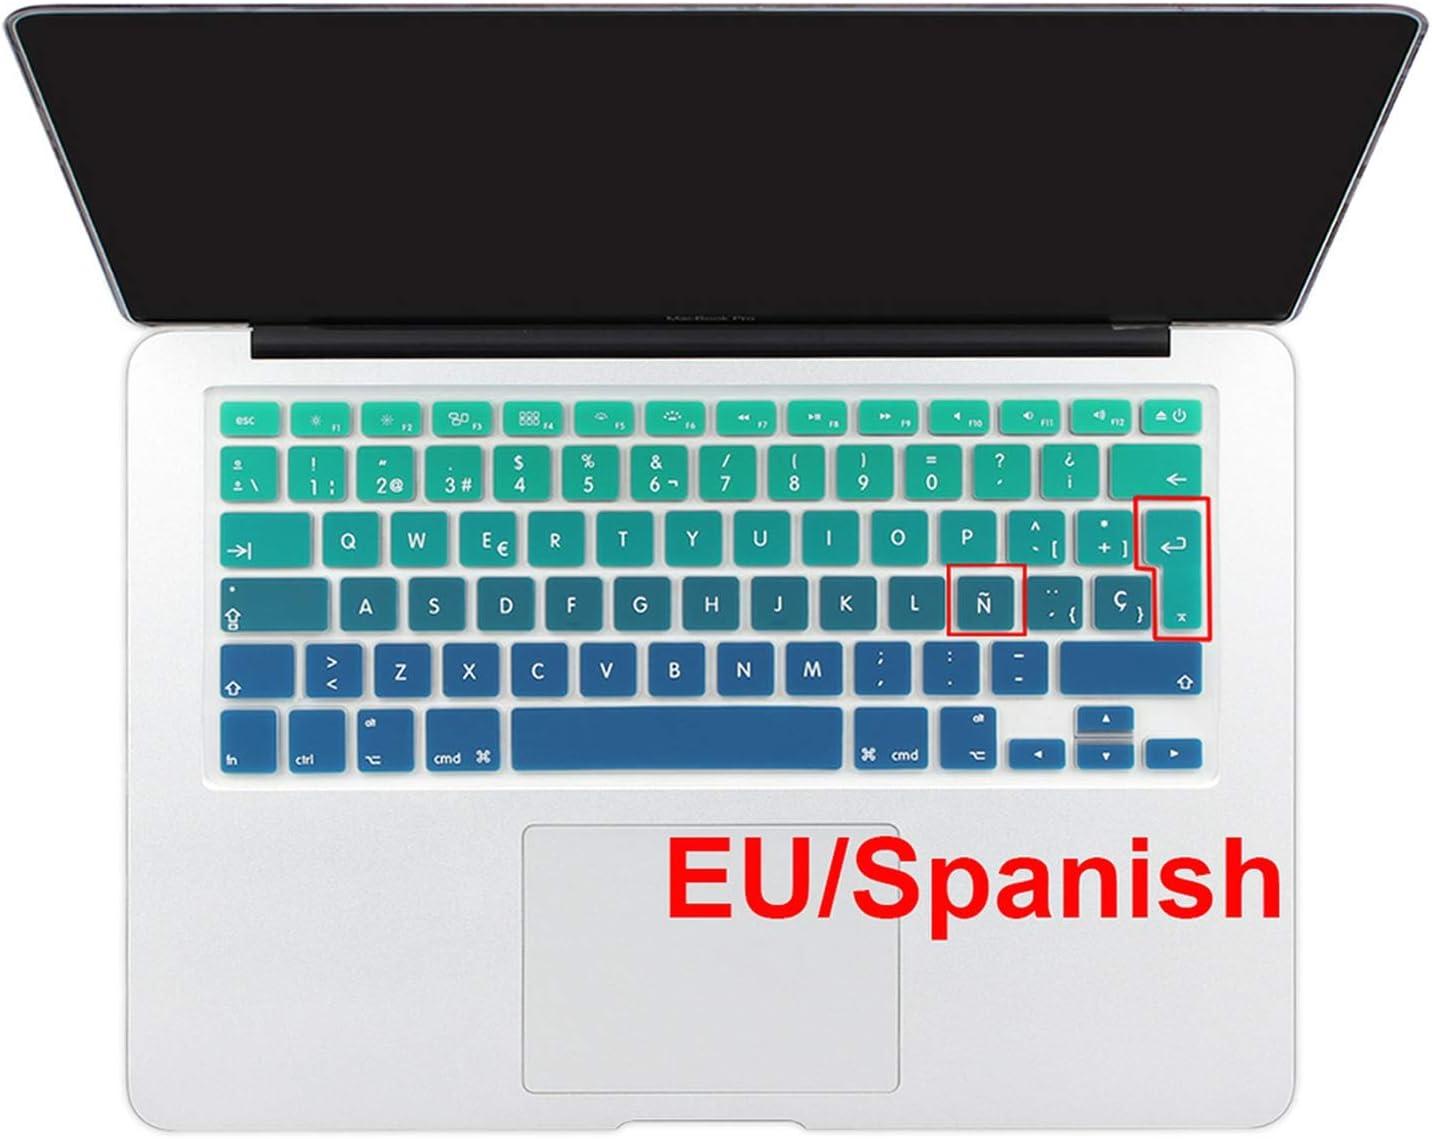 Euro Spanish English Russia Water Dust Proof Keyboard Cover for MacBook air 13 Protector Gradual Change Colors-EU Spanish Rainbow